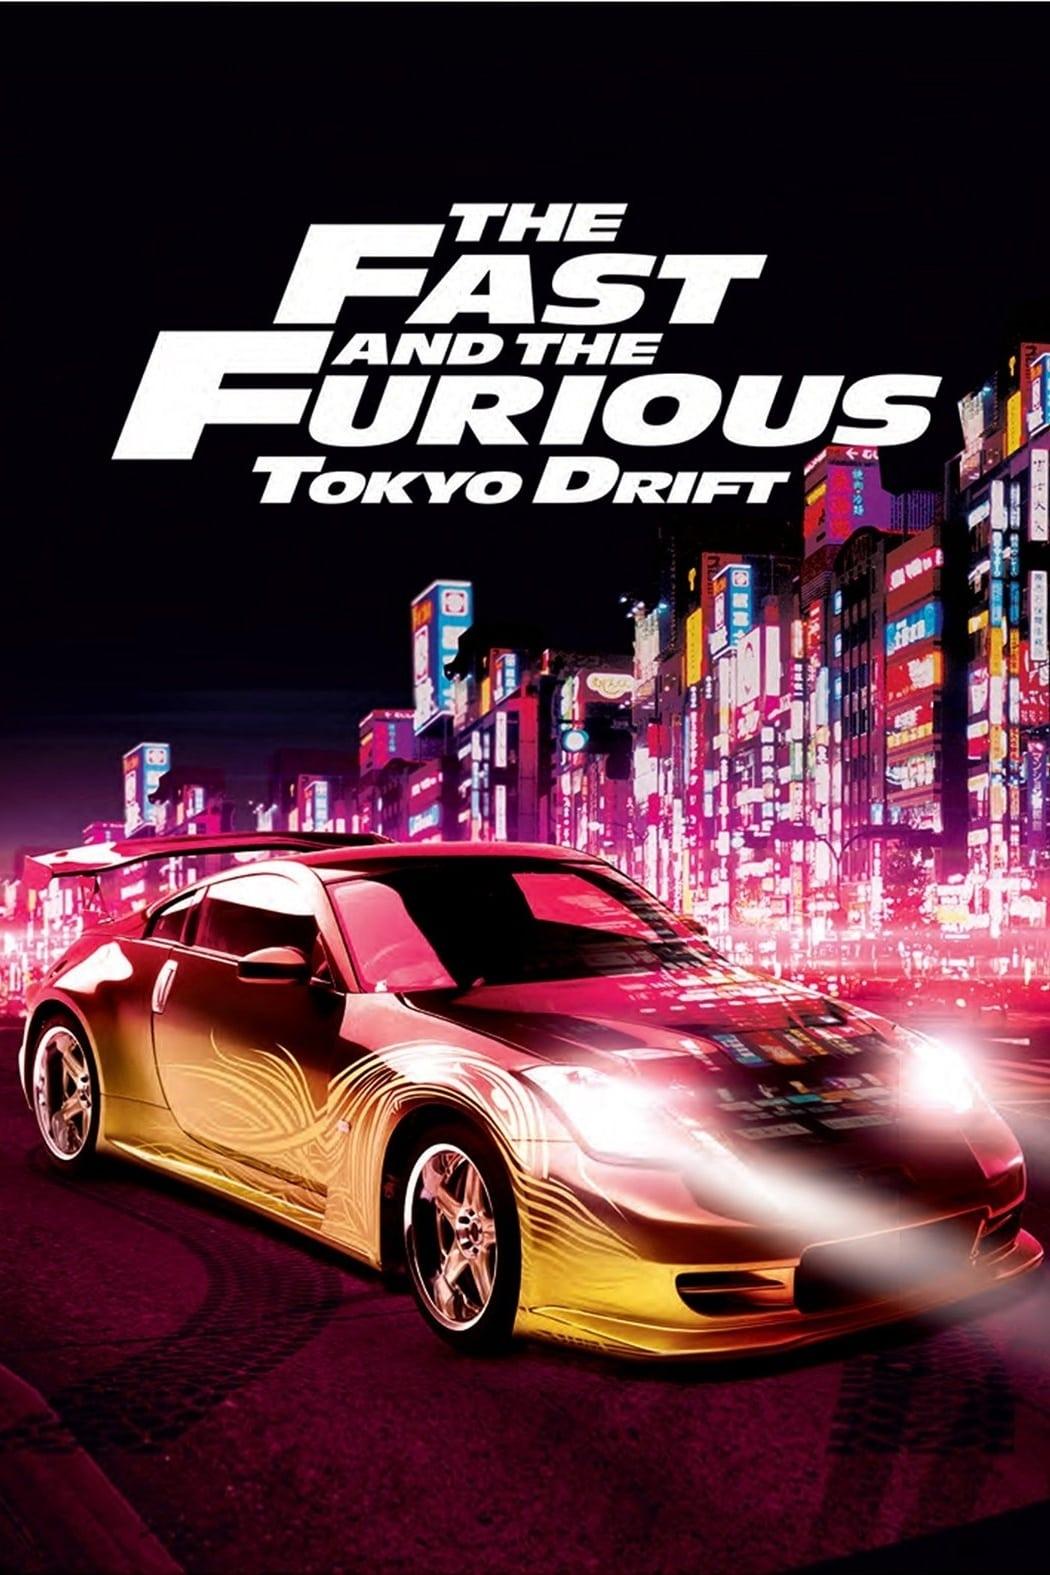 the fast and the furious tokyo drift 2006 gratis films kijken met ondertiteling. Black Bedroom Furniture Sets. Home Design Ideas